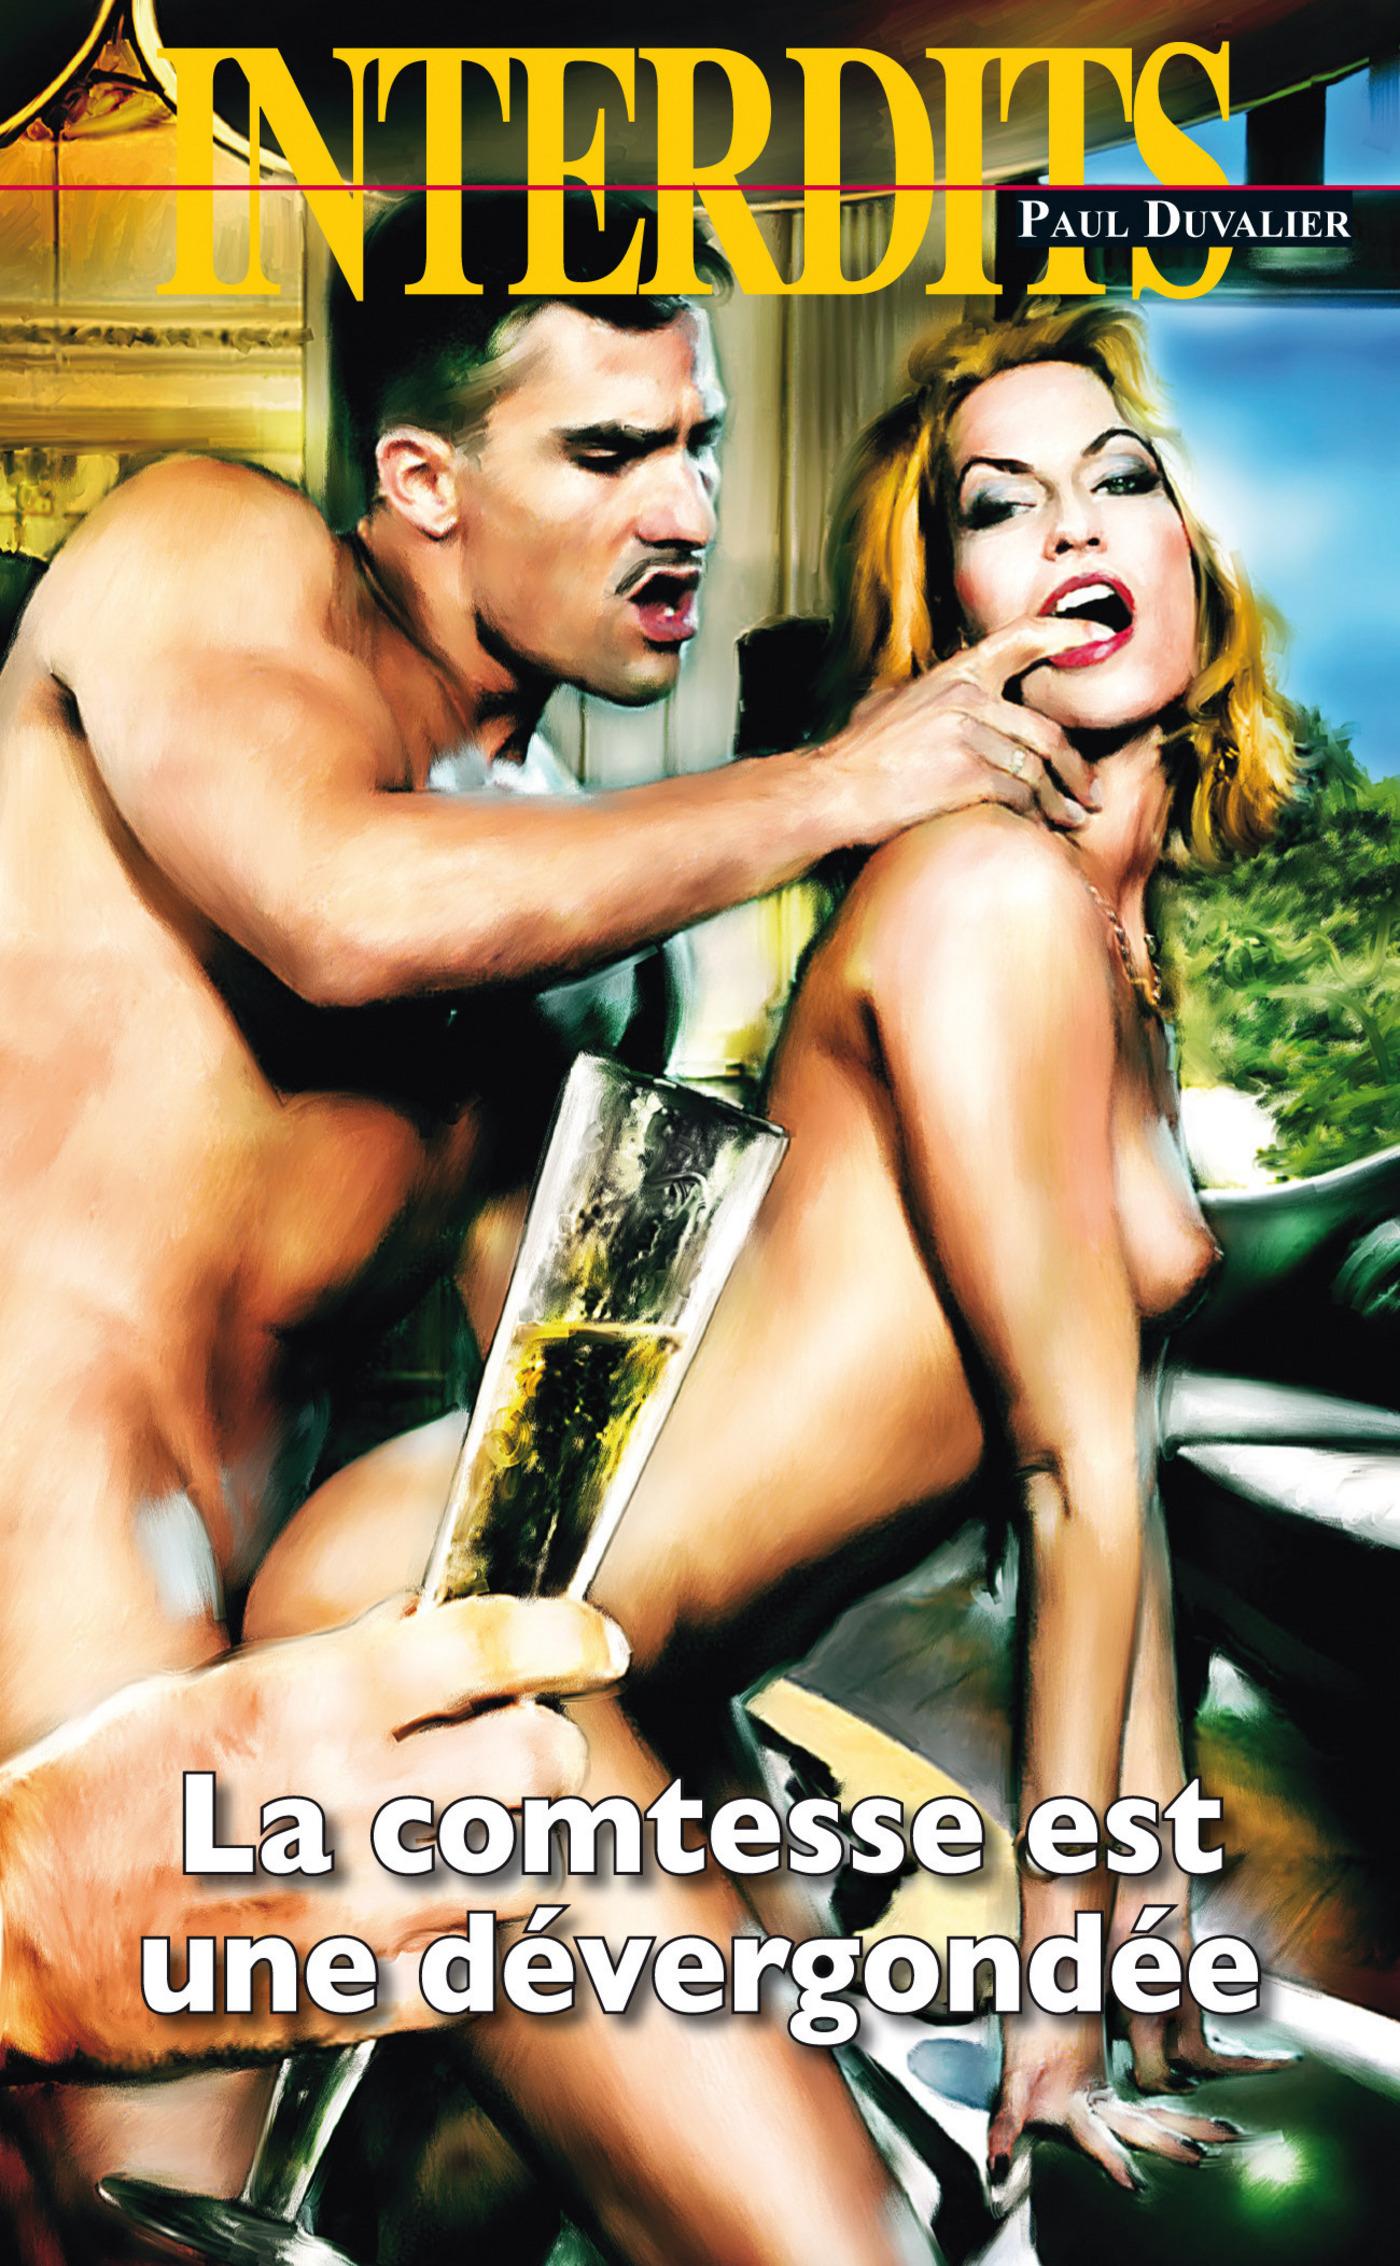 La Comtesse est une dévergondée (ebook)